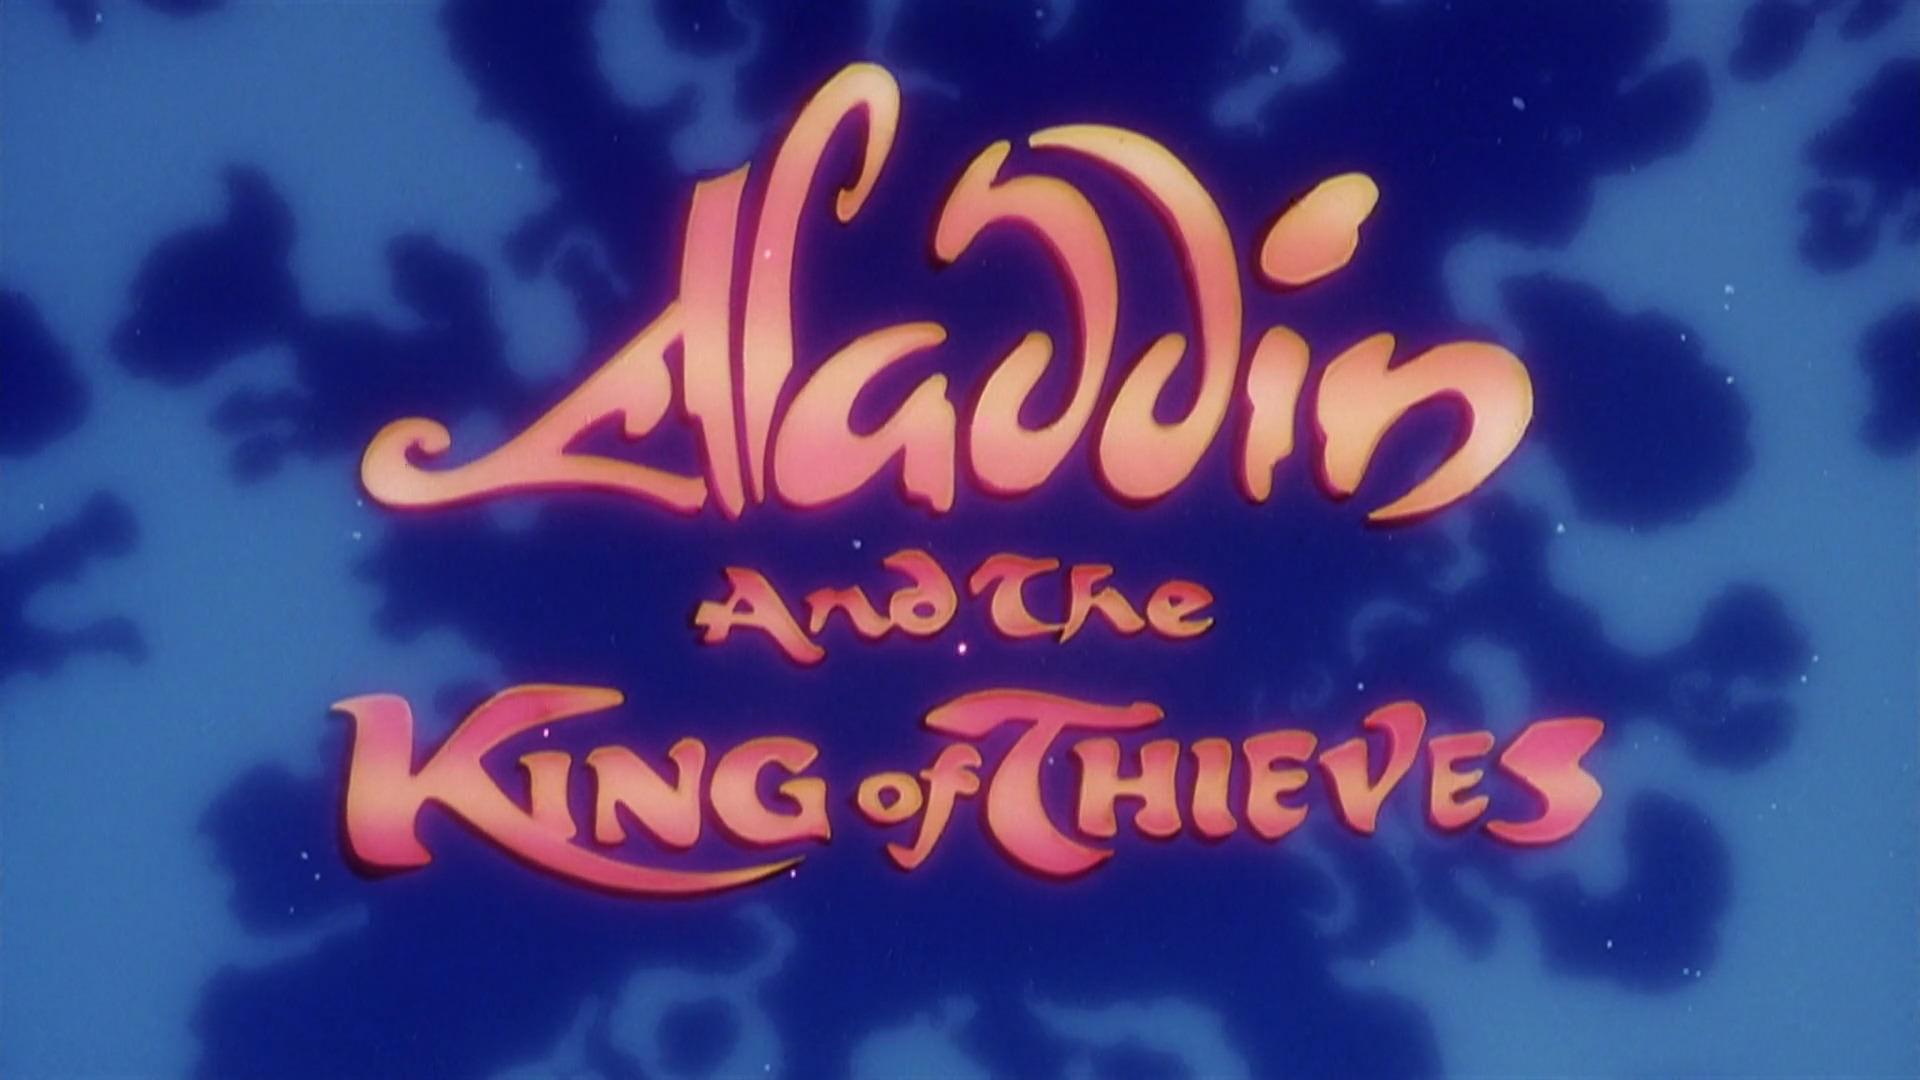 aladdin 1992 full movie download filmywap